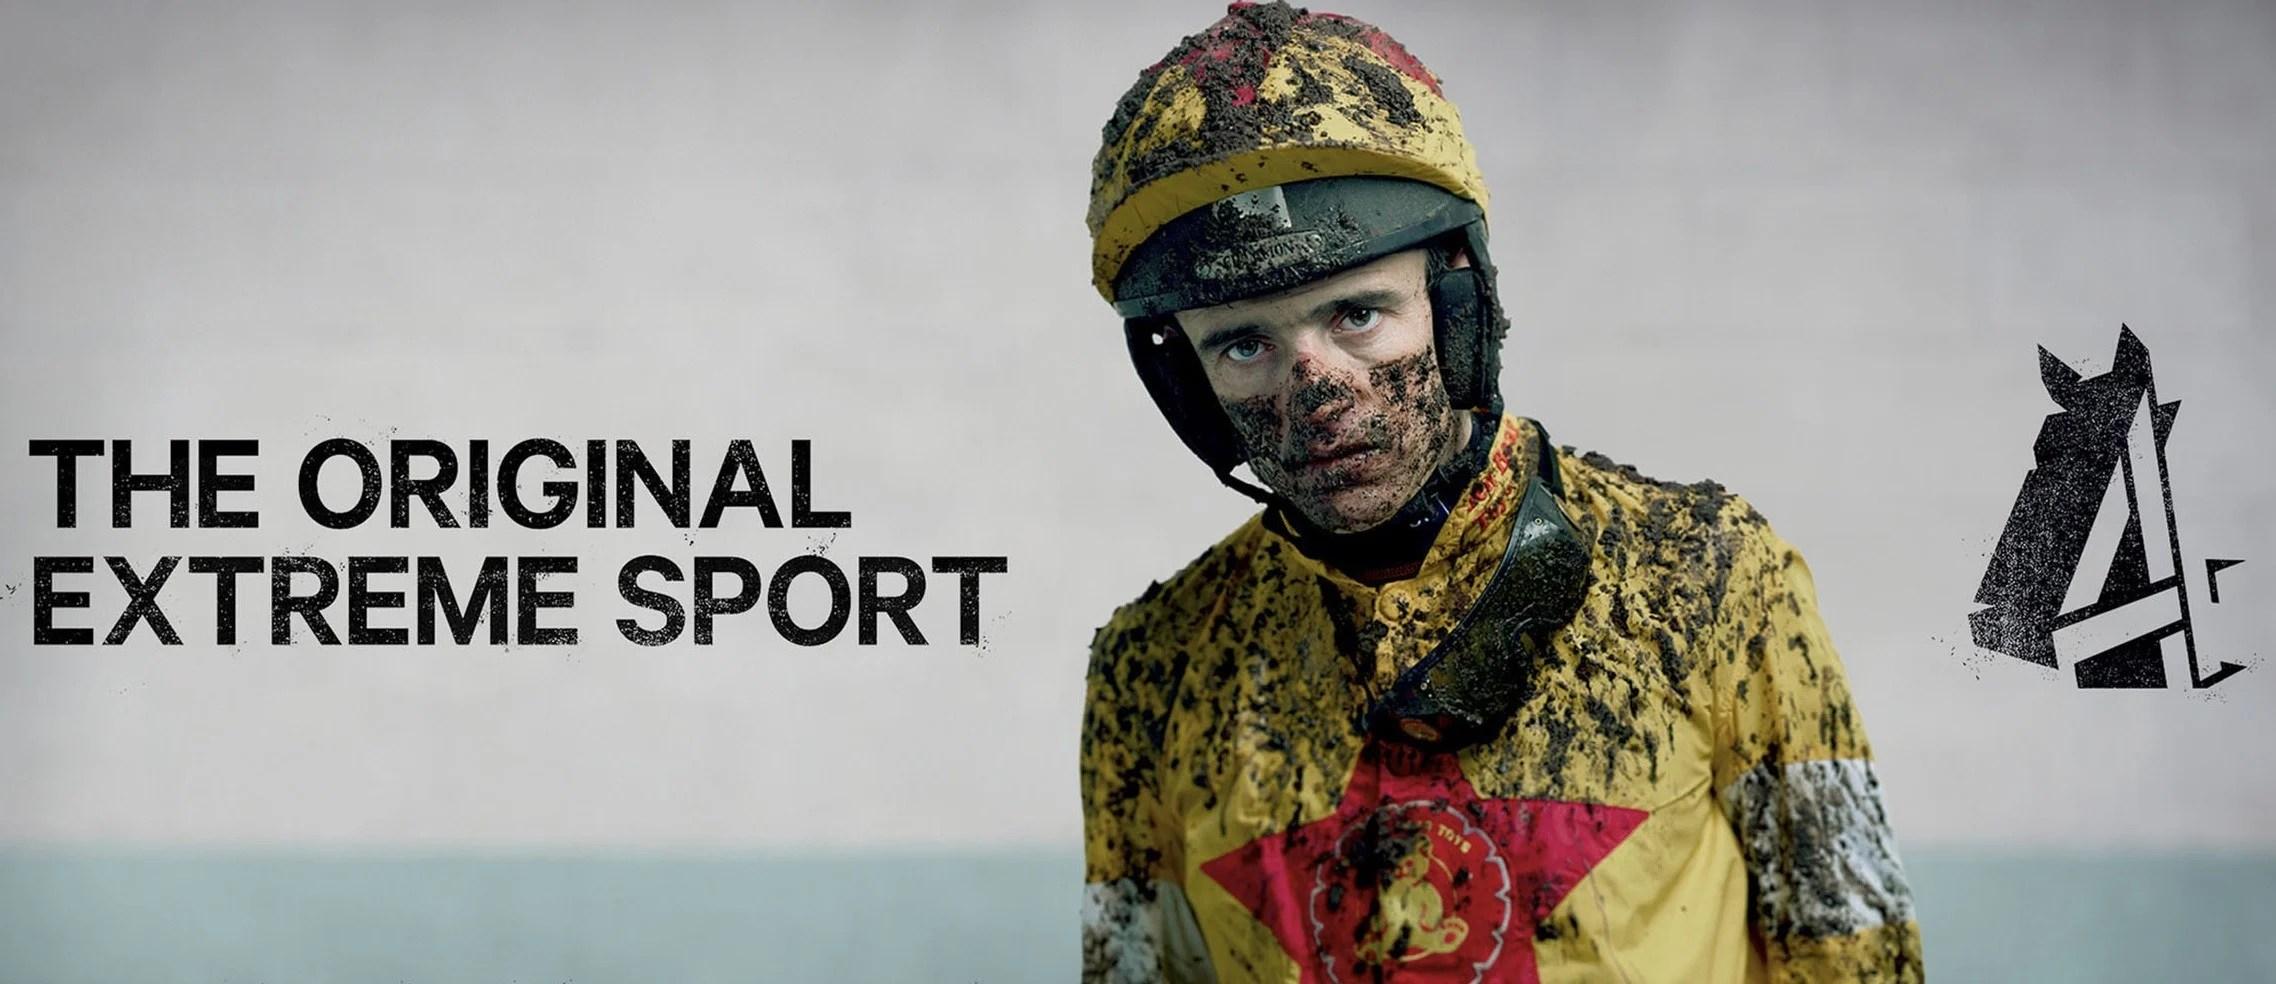 channel 4 racing betfair trading